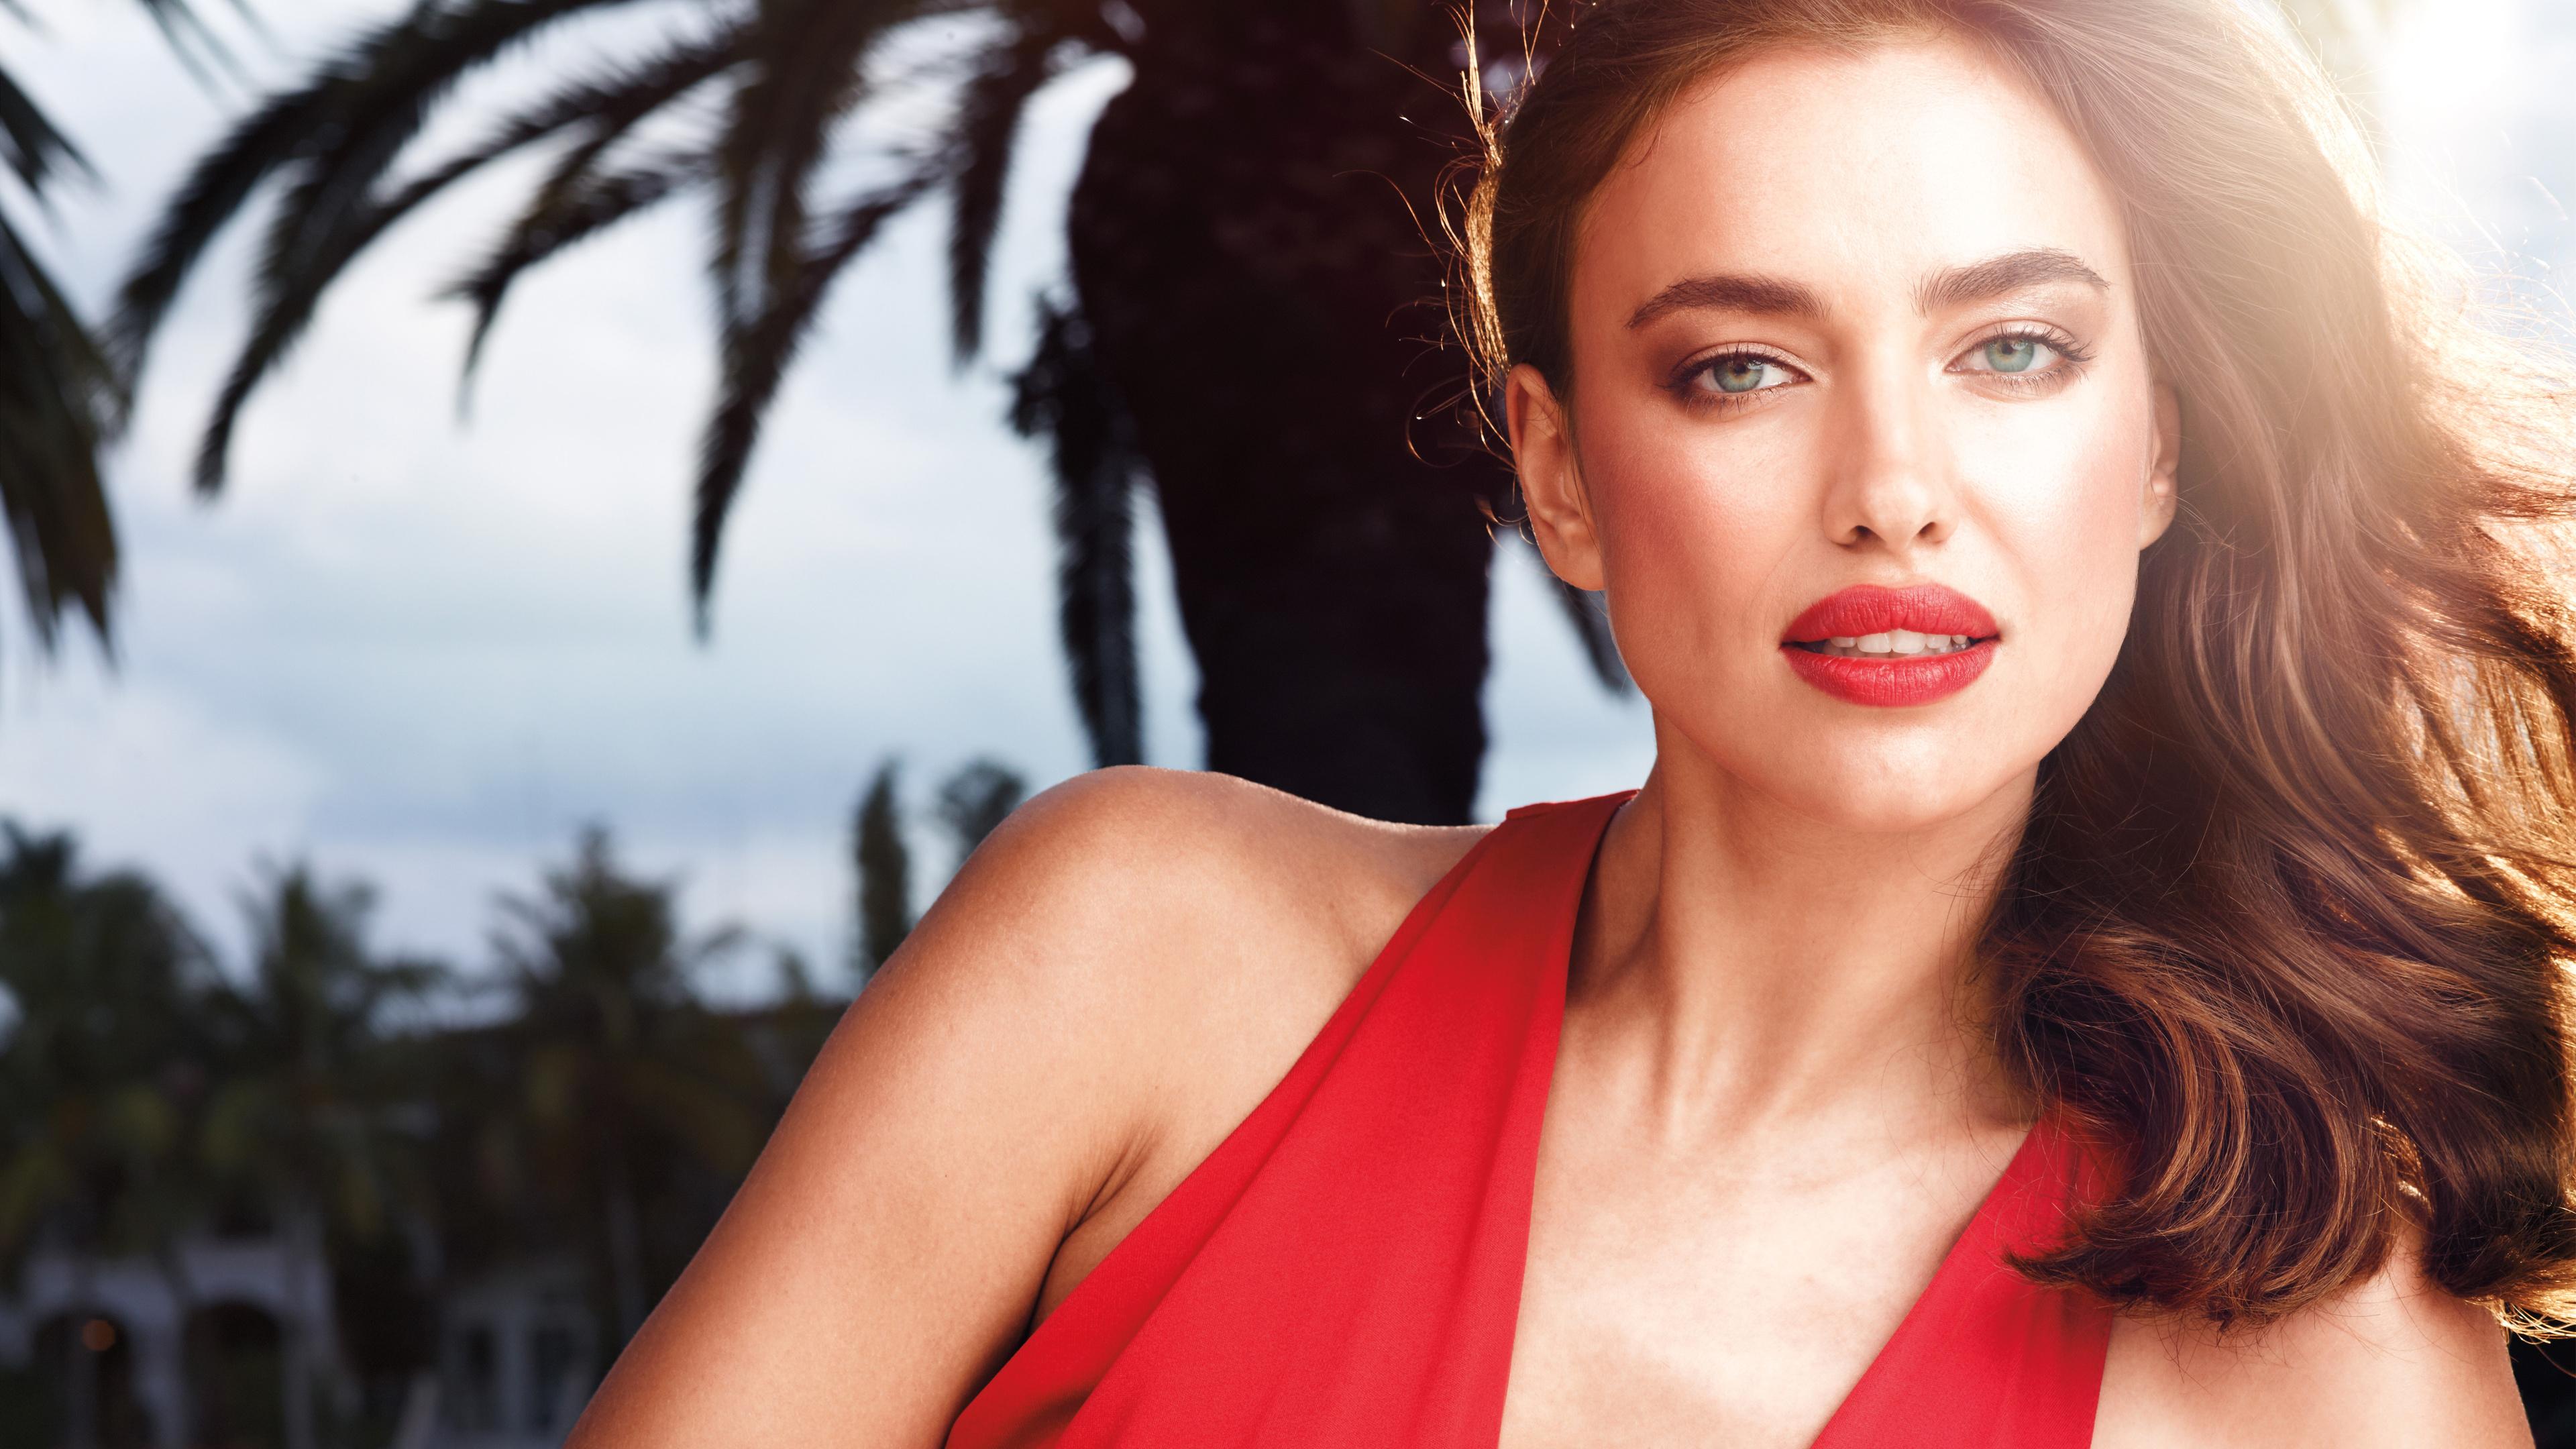 irina shayk red lips 2017 1536857695 - Irina Shayk Red Lips 2017 - red wallpapers, models wallpapers, lips wallpapers, irina shayk wallpapers, girls wallpapers, celebrities wallpapers